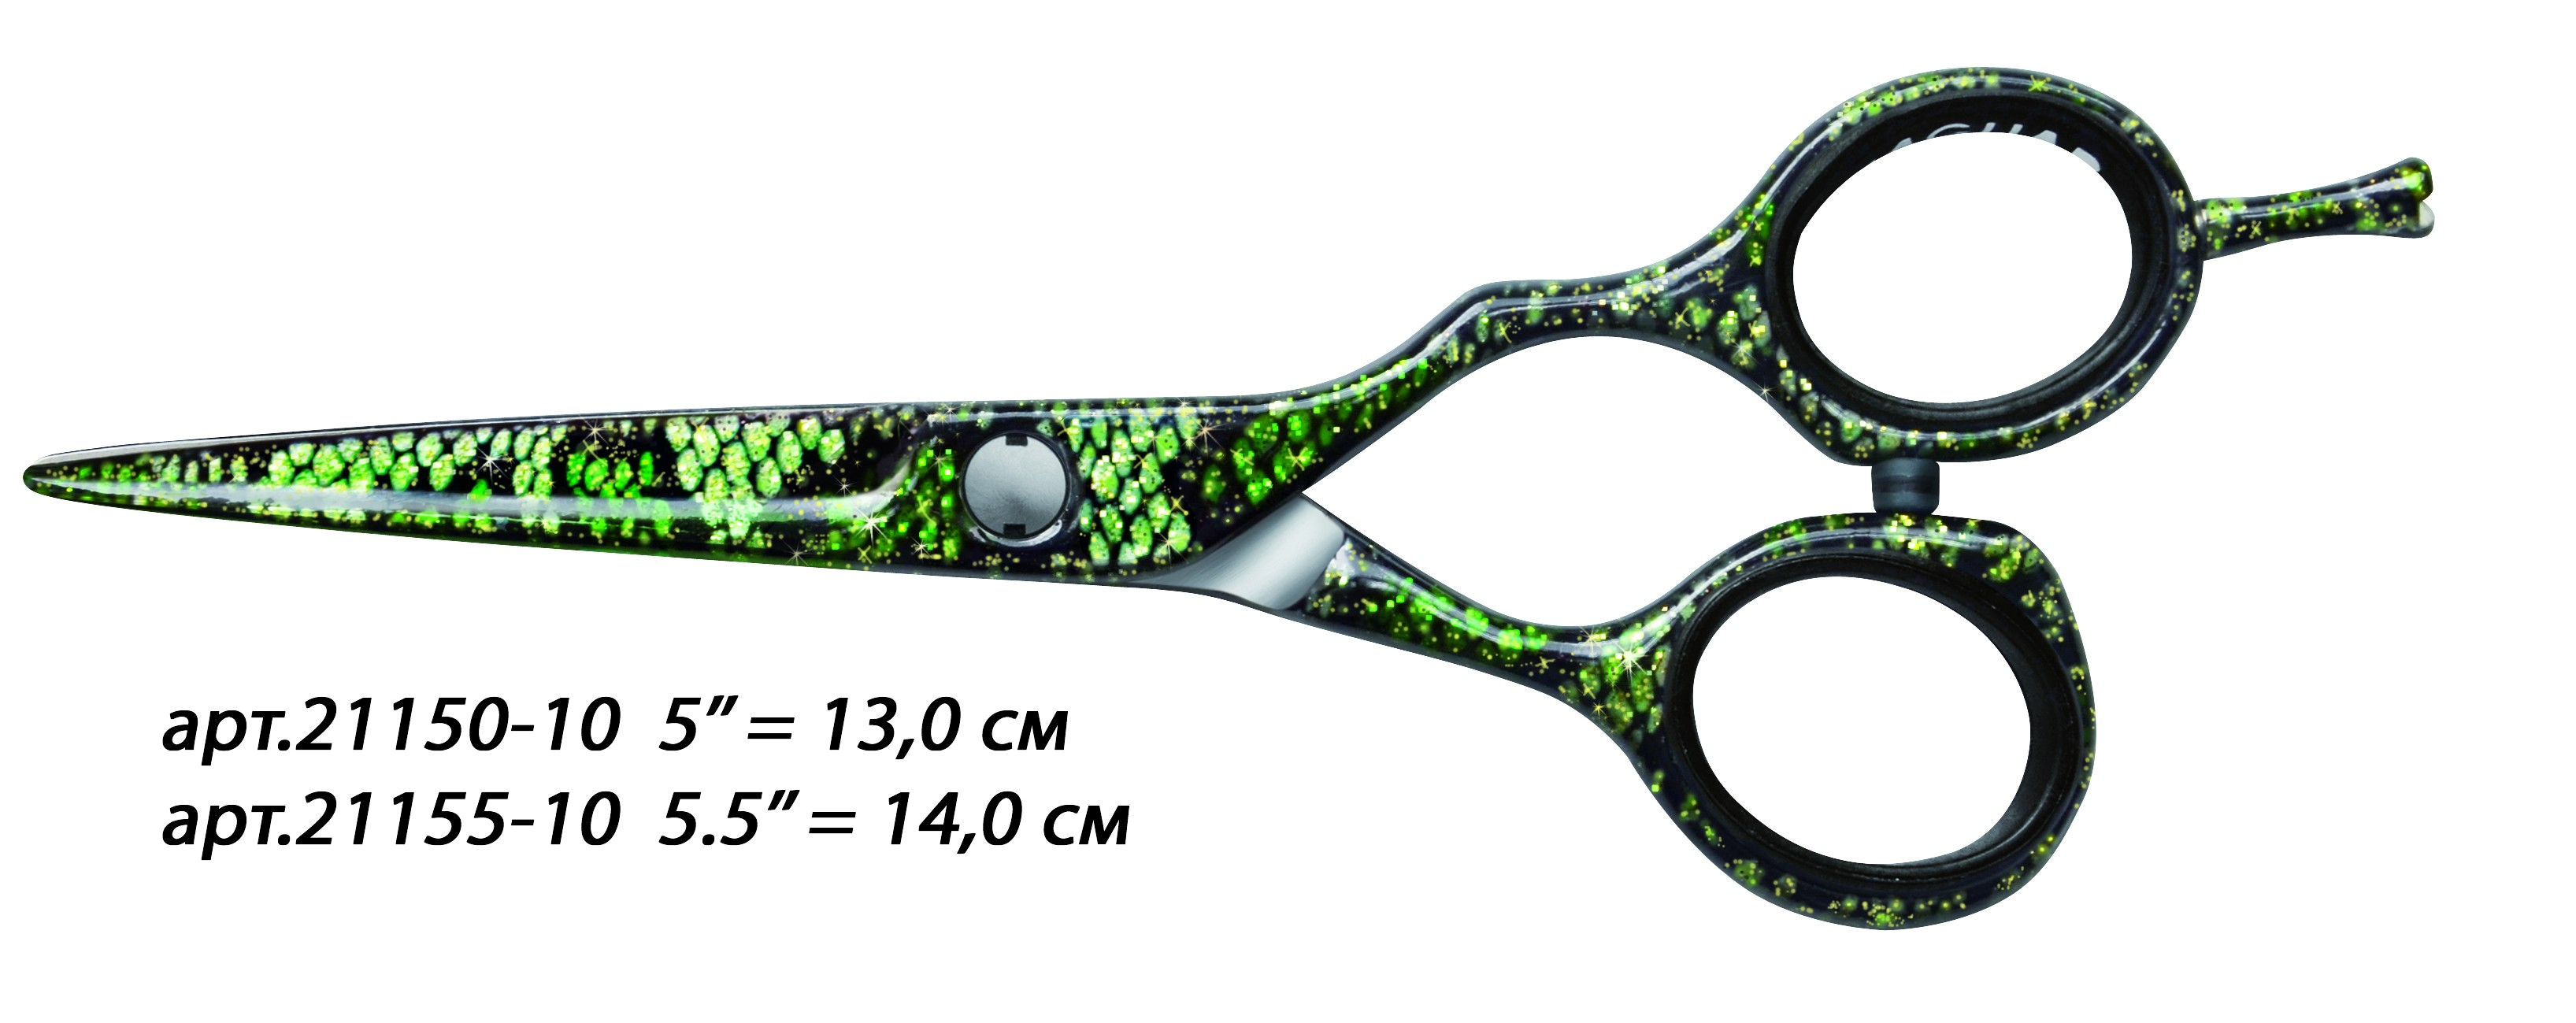 Jaguar ножницы jaguar green mamba 5,5(14cm)gl